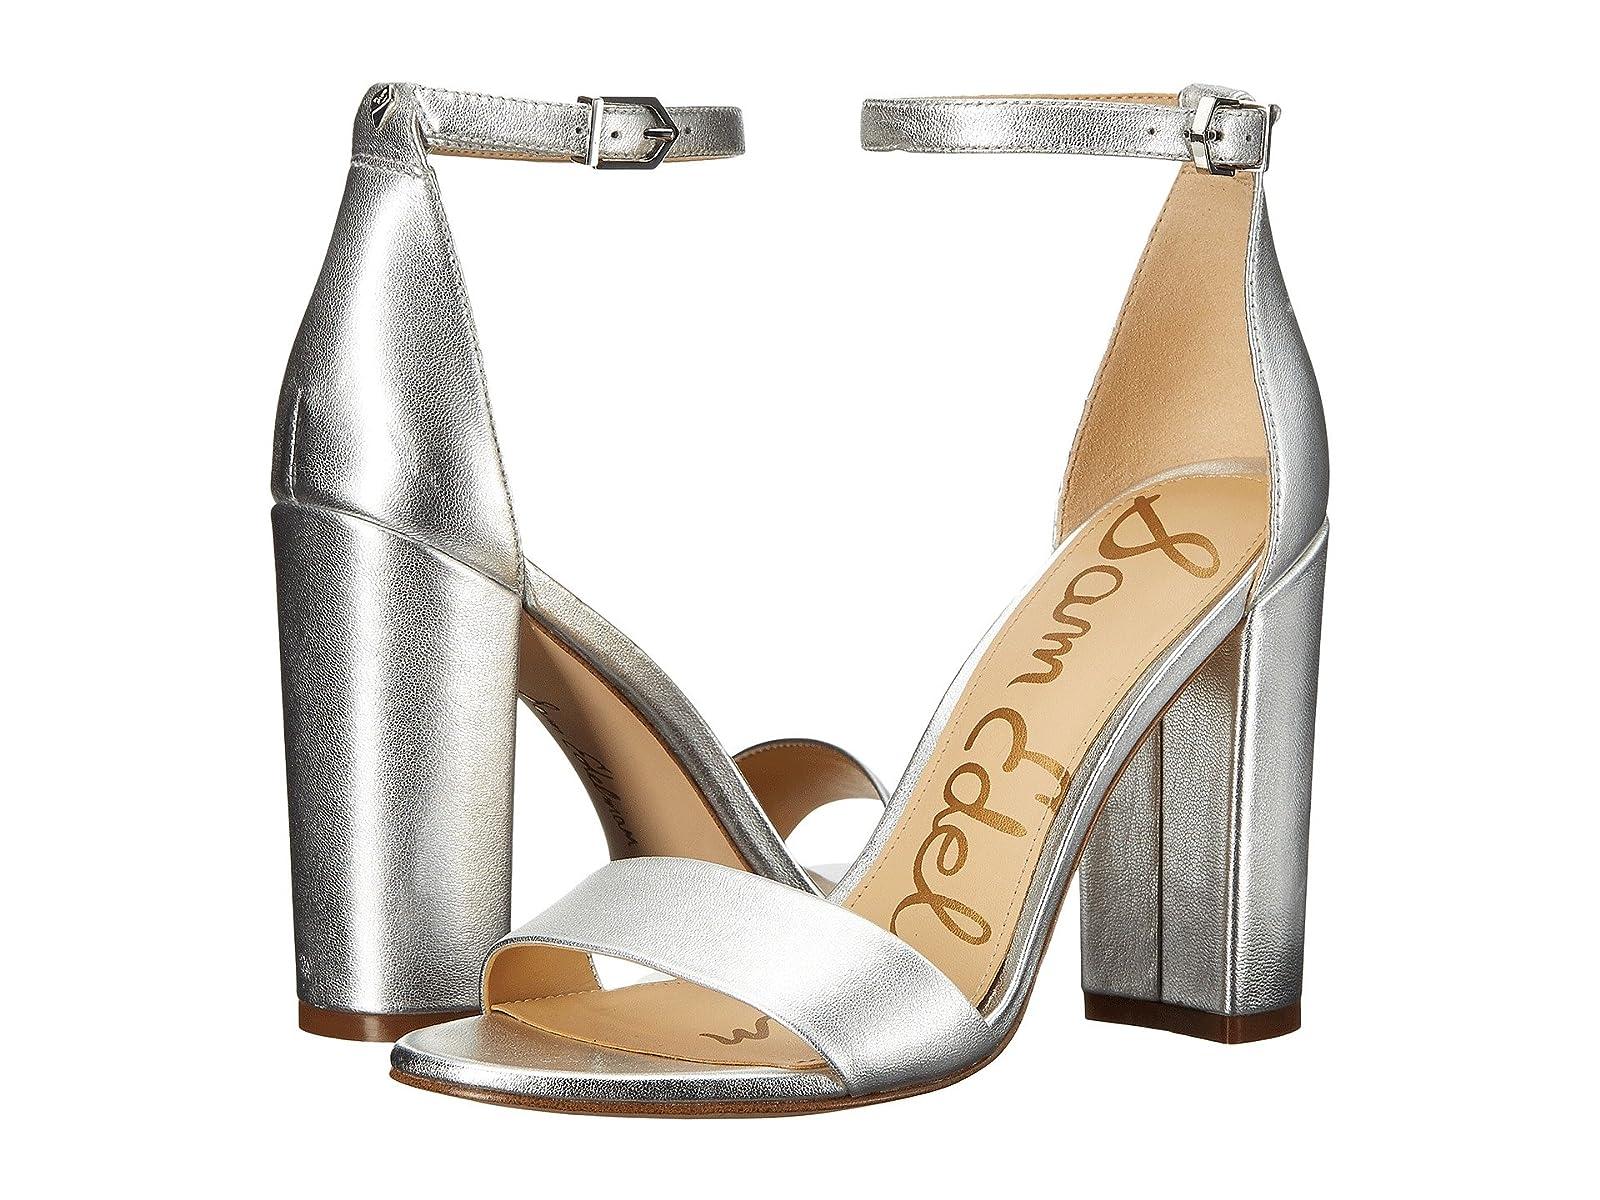 Sam Edelman Yaro Ankle Strap Sandal HeelAtmospheric grades have affordable shoes